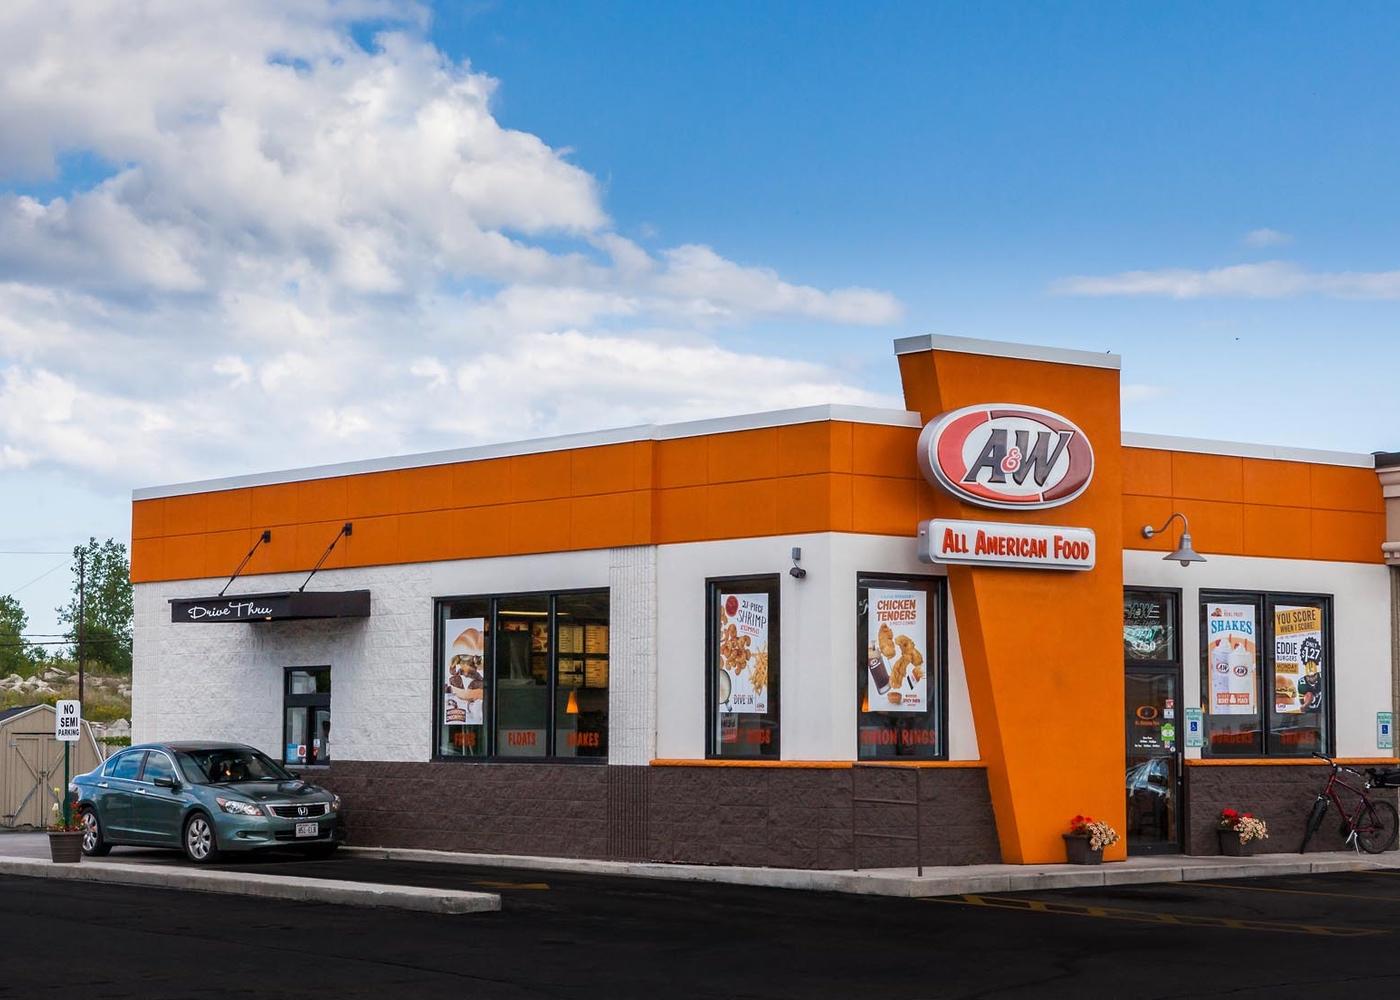 A&W Restaurant Drive-Thru